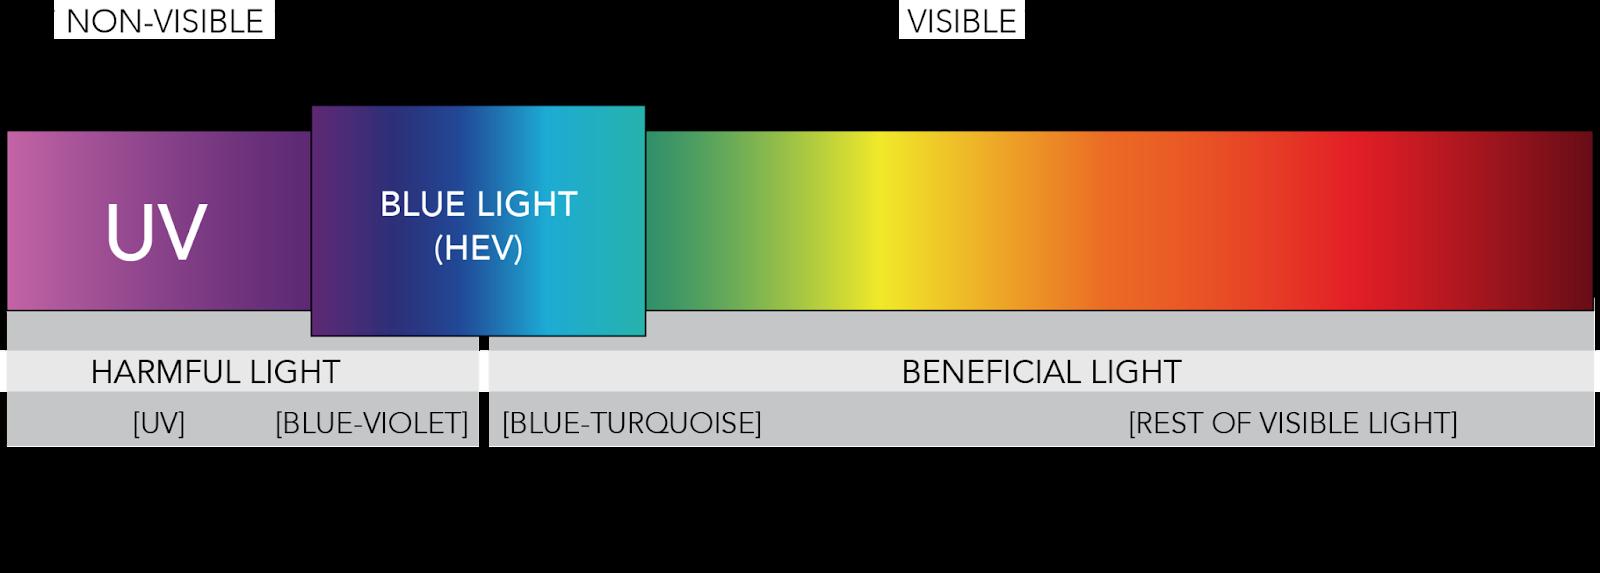 blue light spectrum